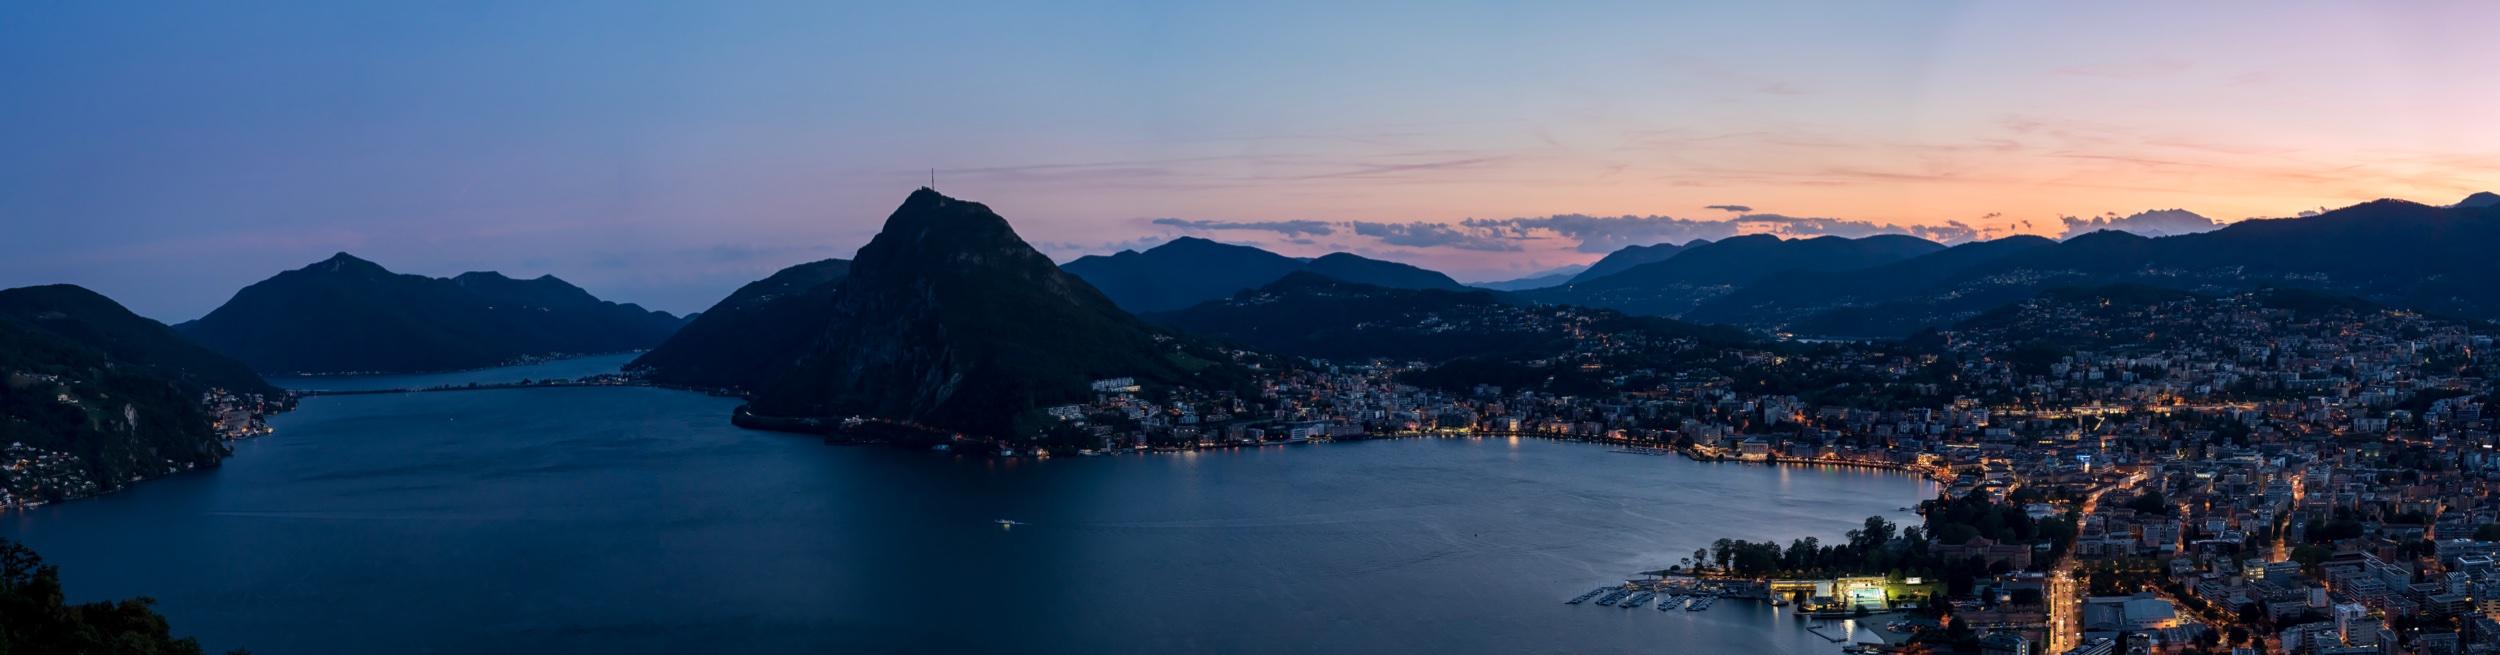 Lugano_Mega_Panorama_RafaelZeier